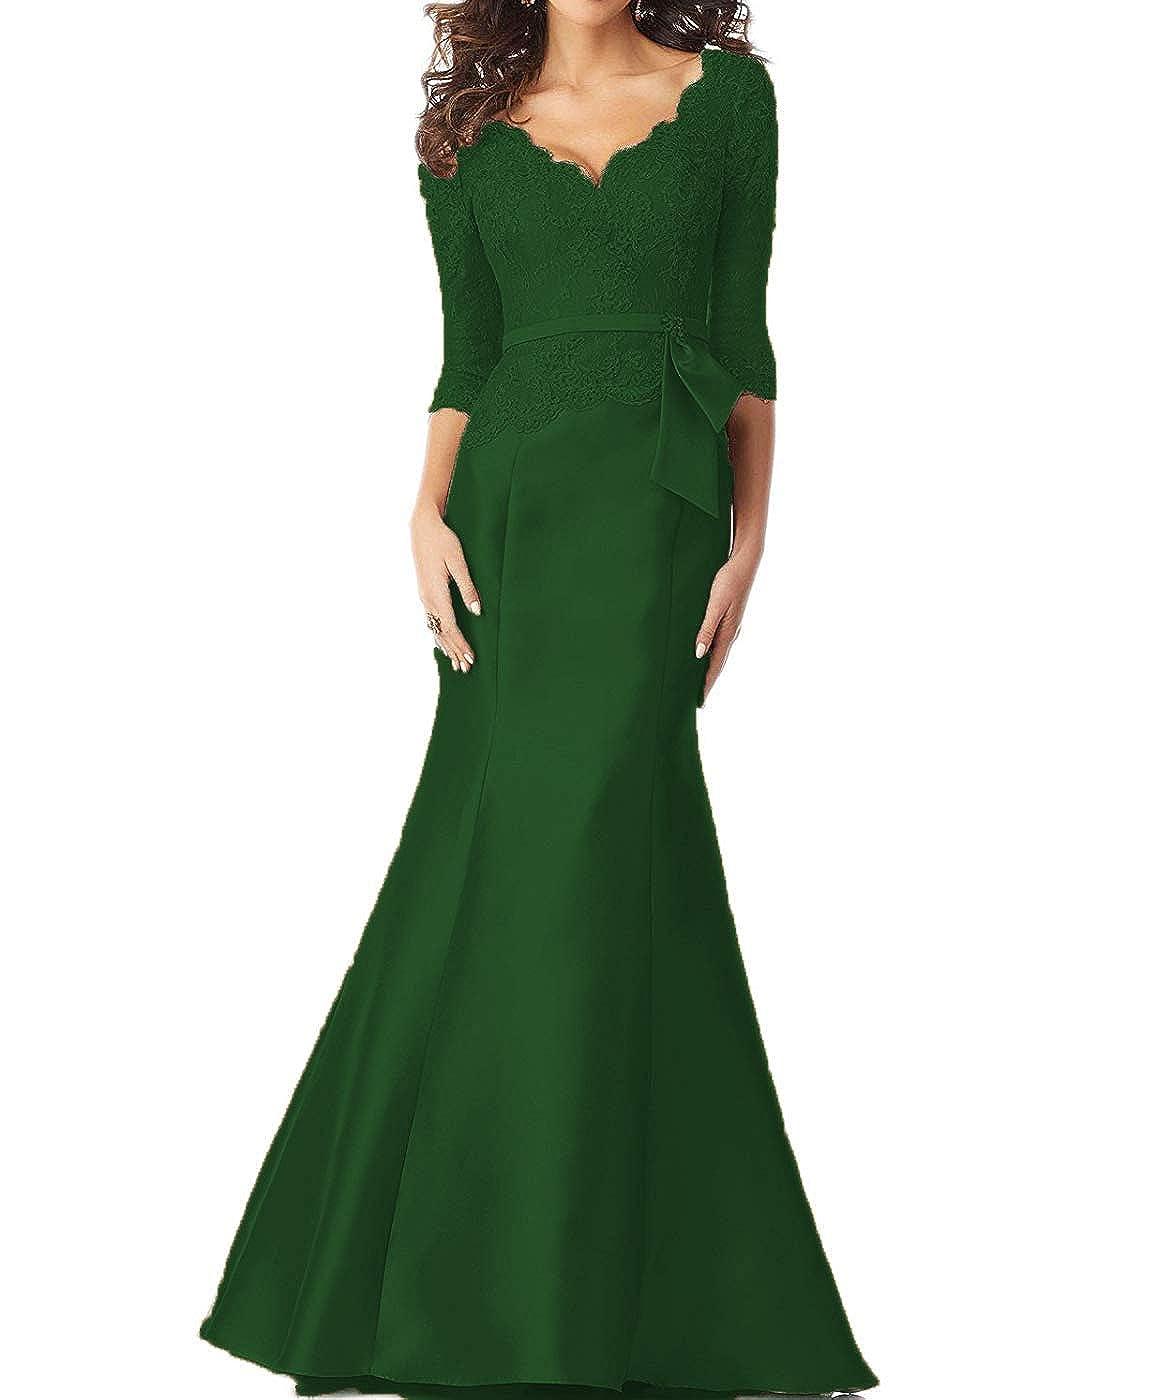 Dark Green tutu.vivi Women's VNeck Lace Mermaid Evening Prom Dresses 3 4 Sleeves Appliques Long Formal Gown